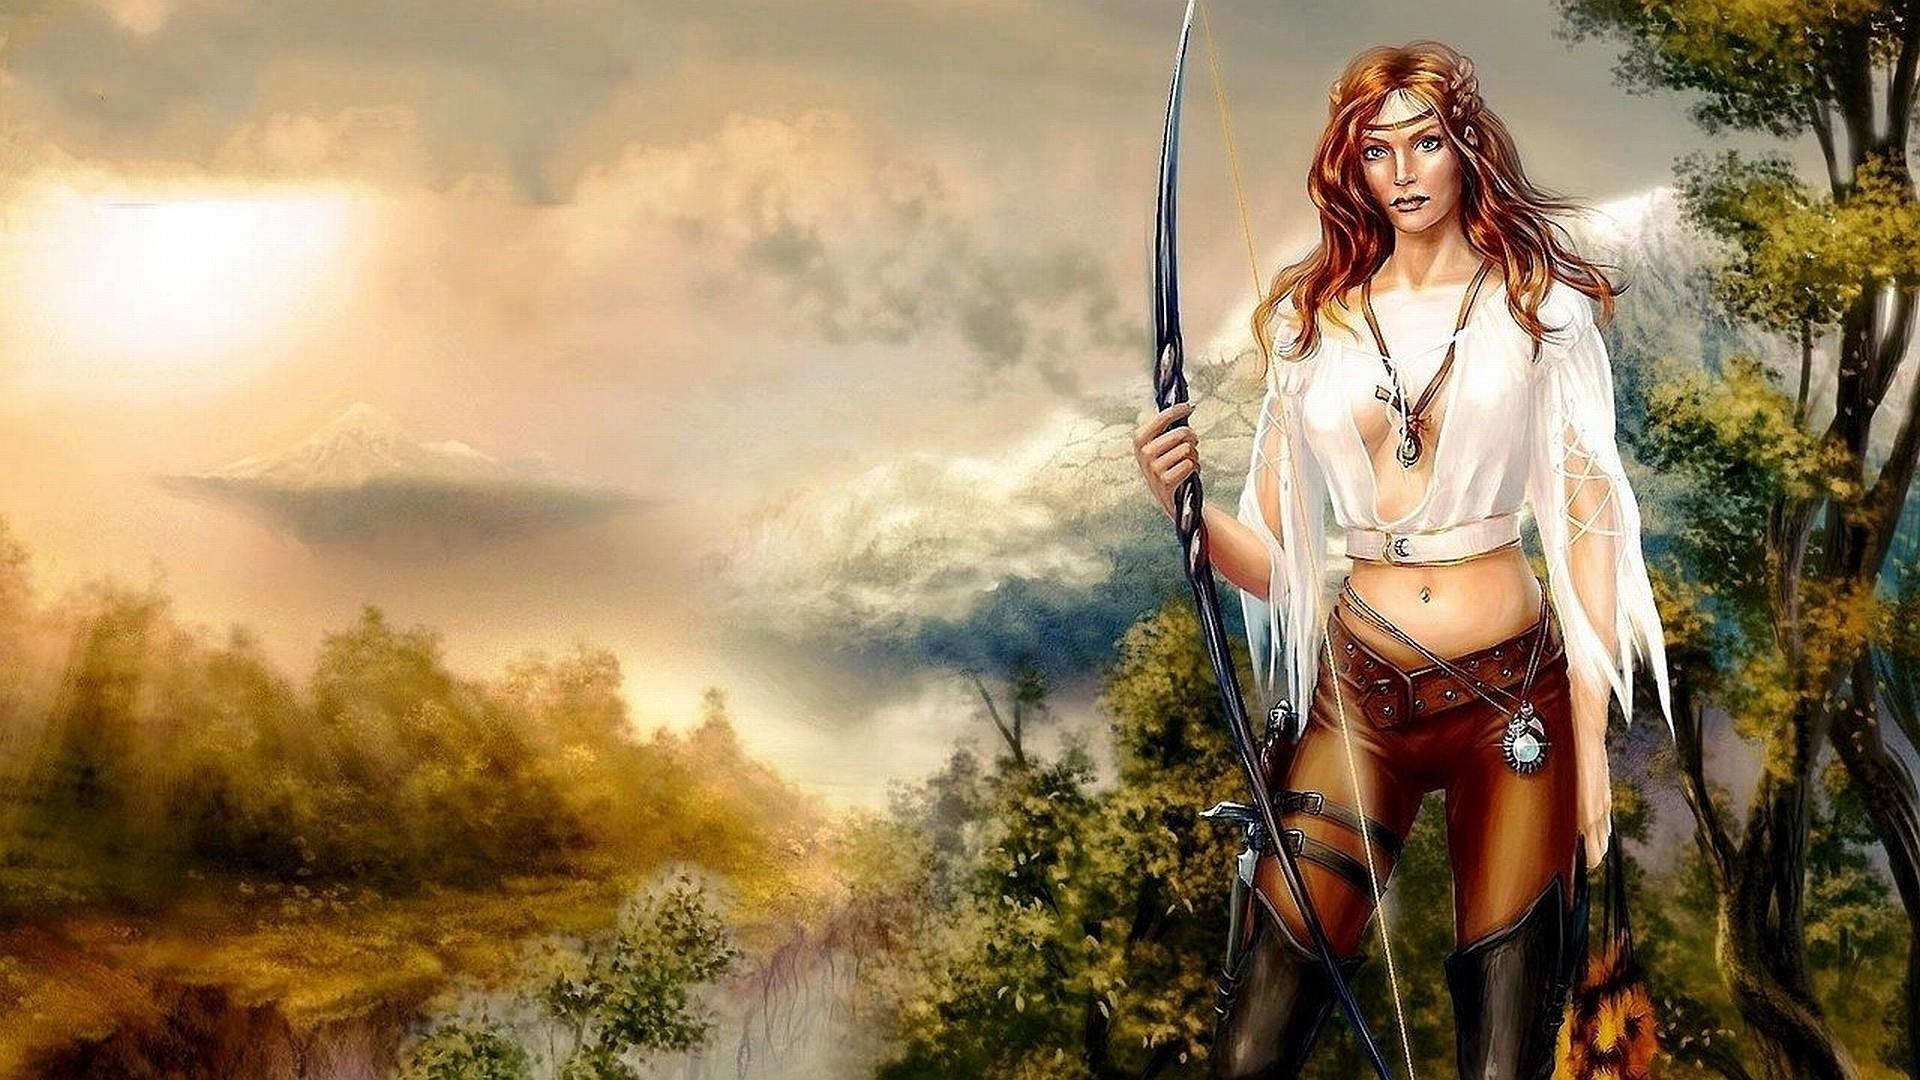 fantasy women warrior Wallpaper Backgrounds